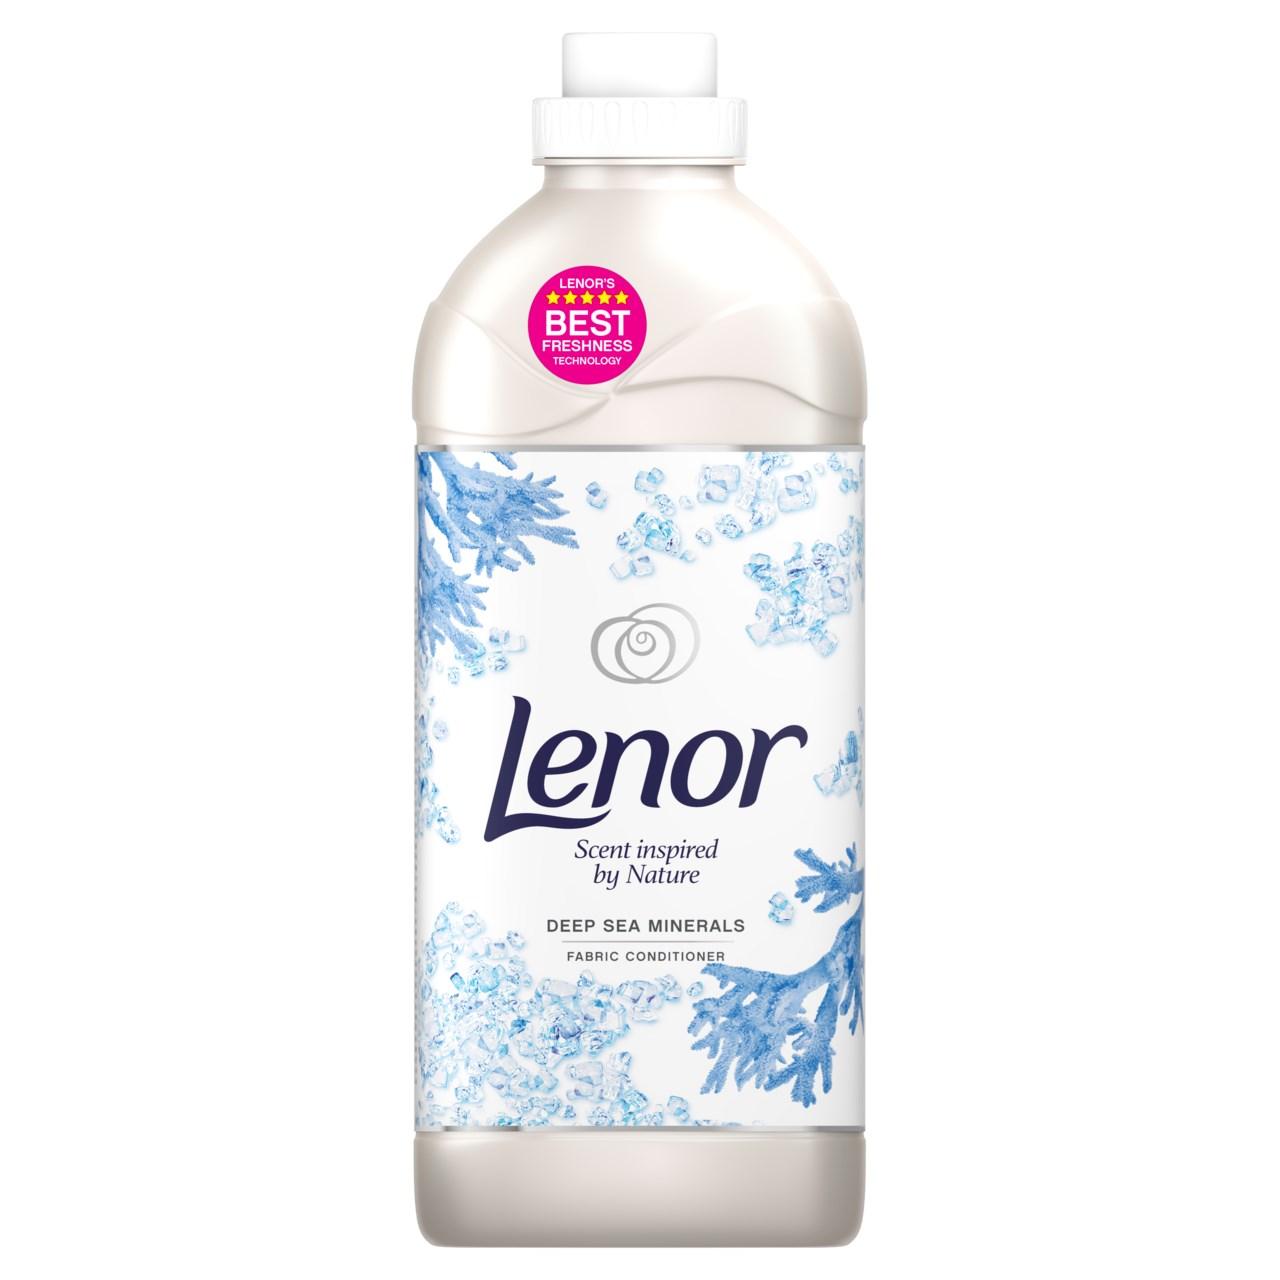 Lenor Deep Sea Minerals aviváž 46 praní 1x1380 ml